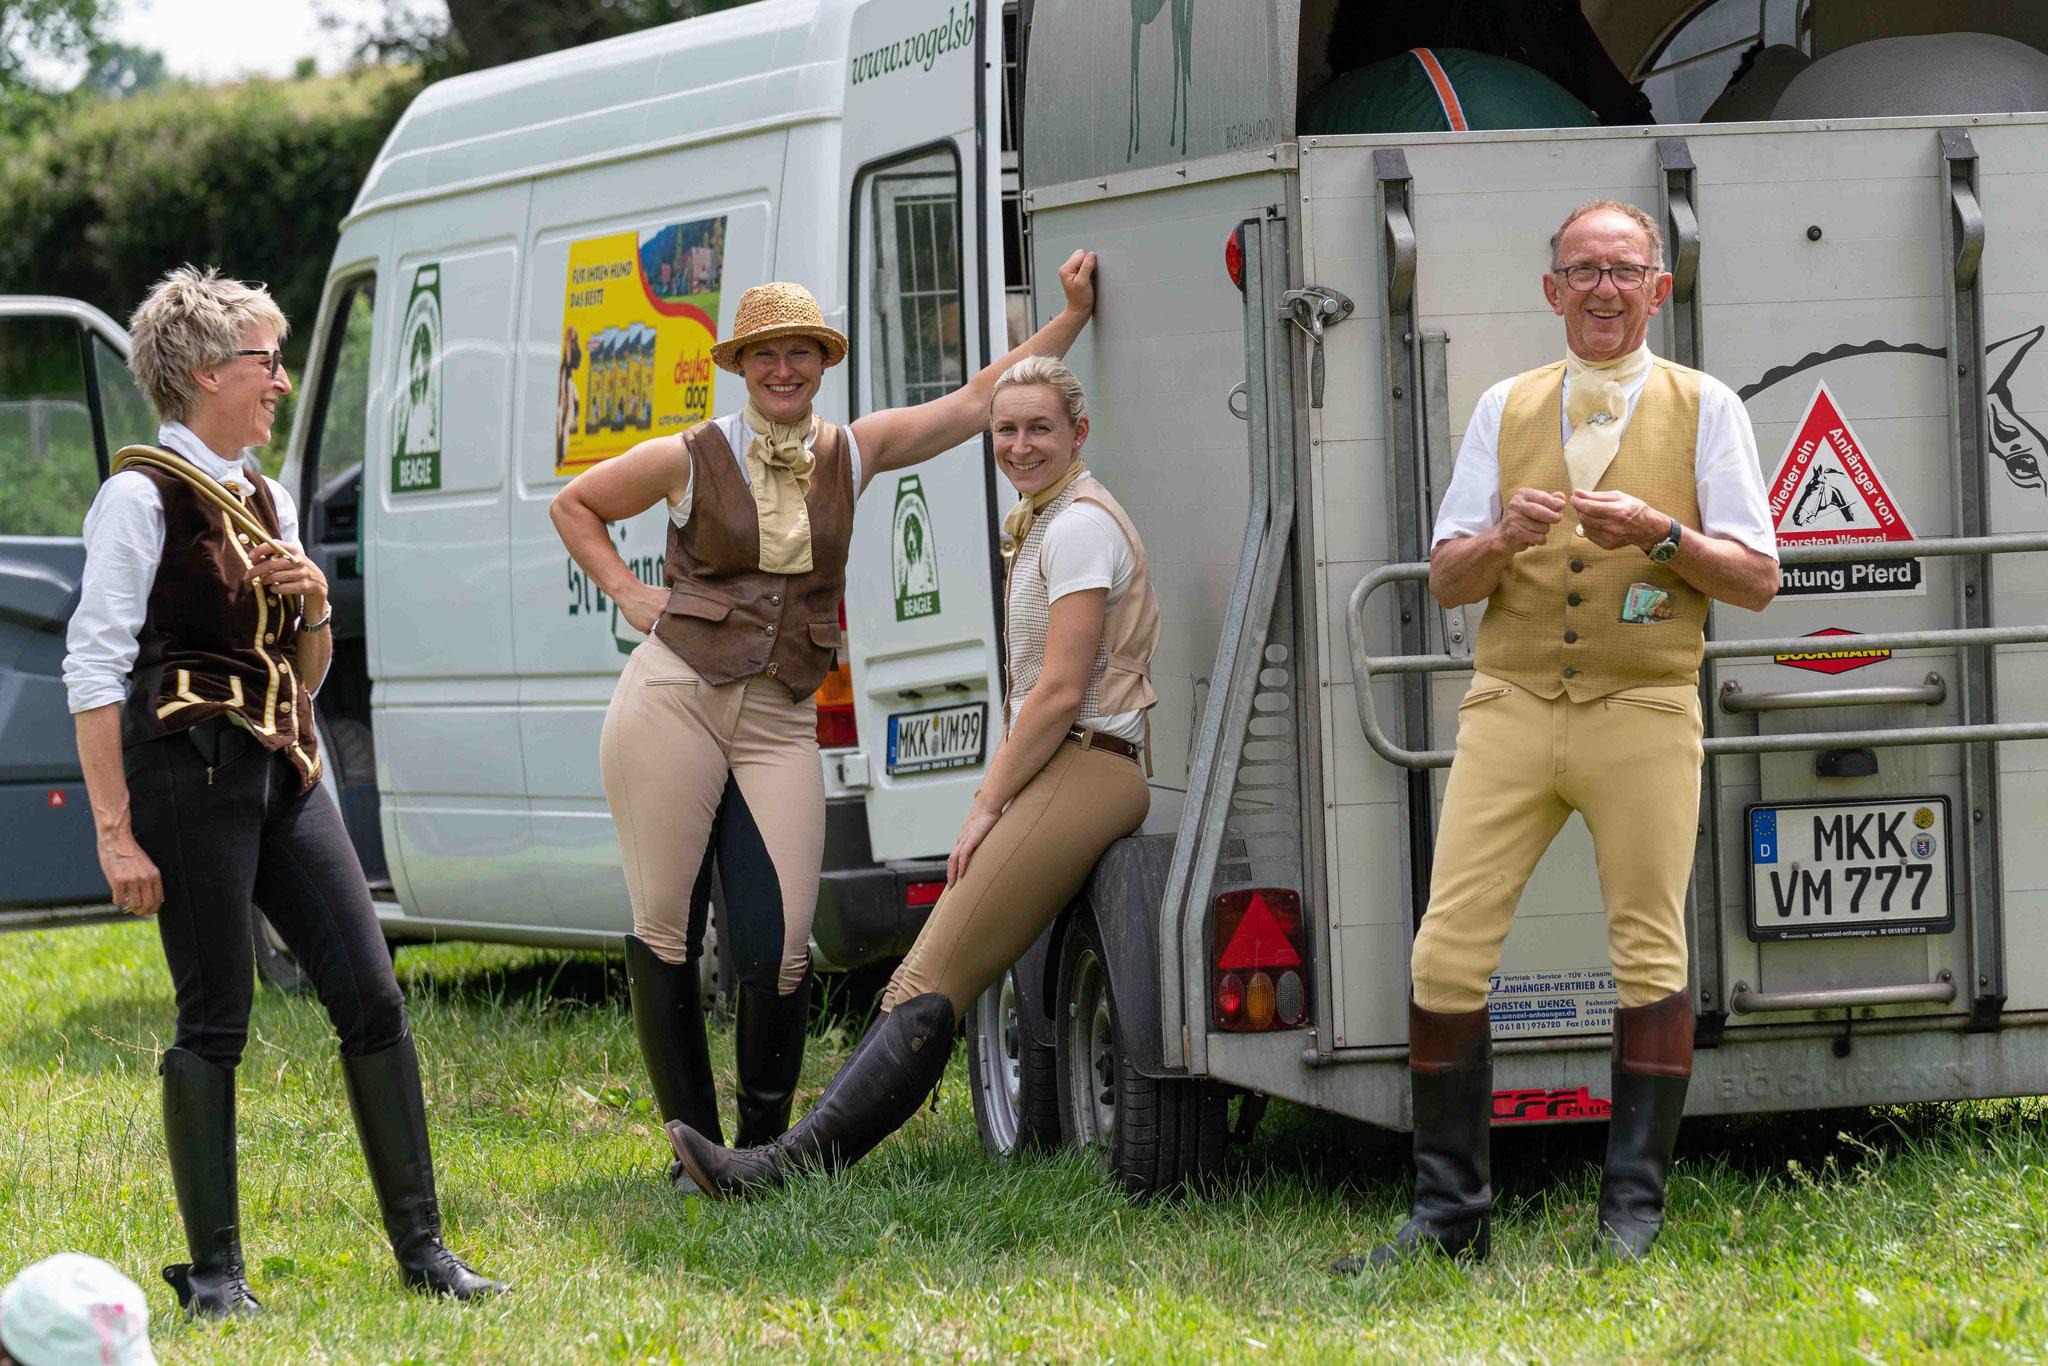 Jagdfotos vom Team @Givemeasmile.de auf der Fotojagd, Peter Jäger   #givemeasmilede  Schleppjagd Büdingen, Heuschleppe Rosenhof, 27.06.2020